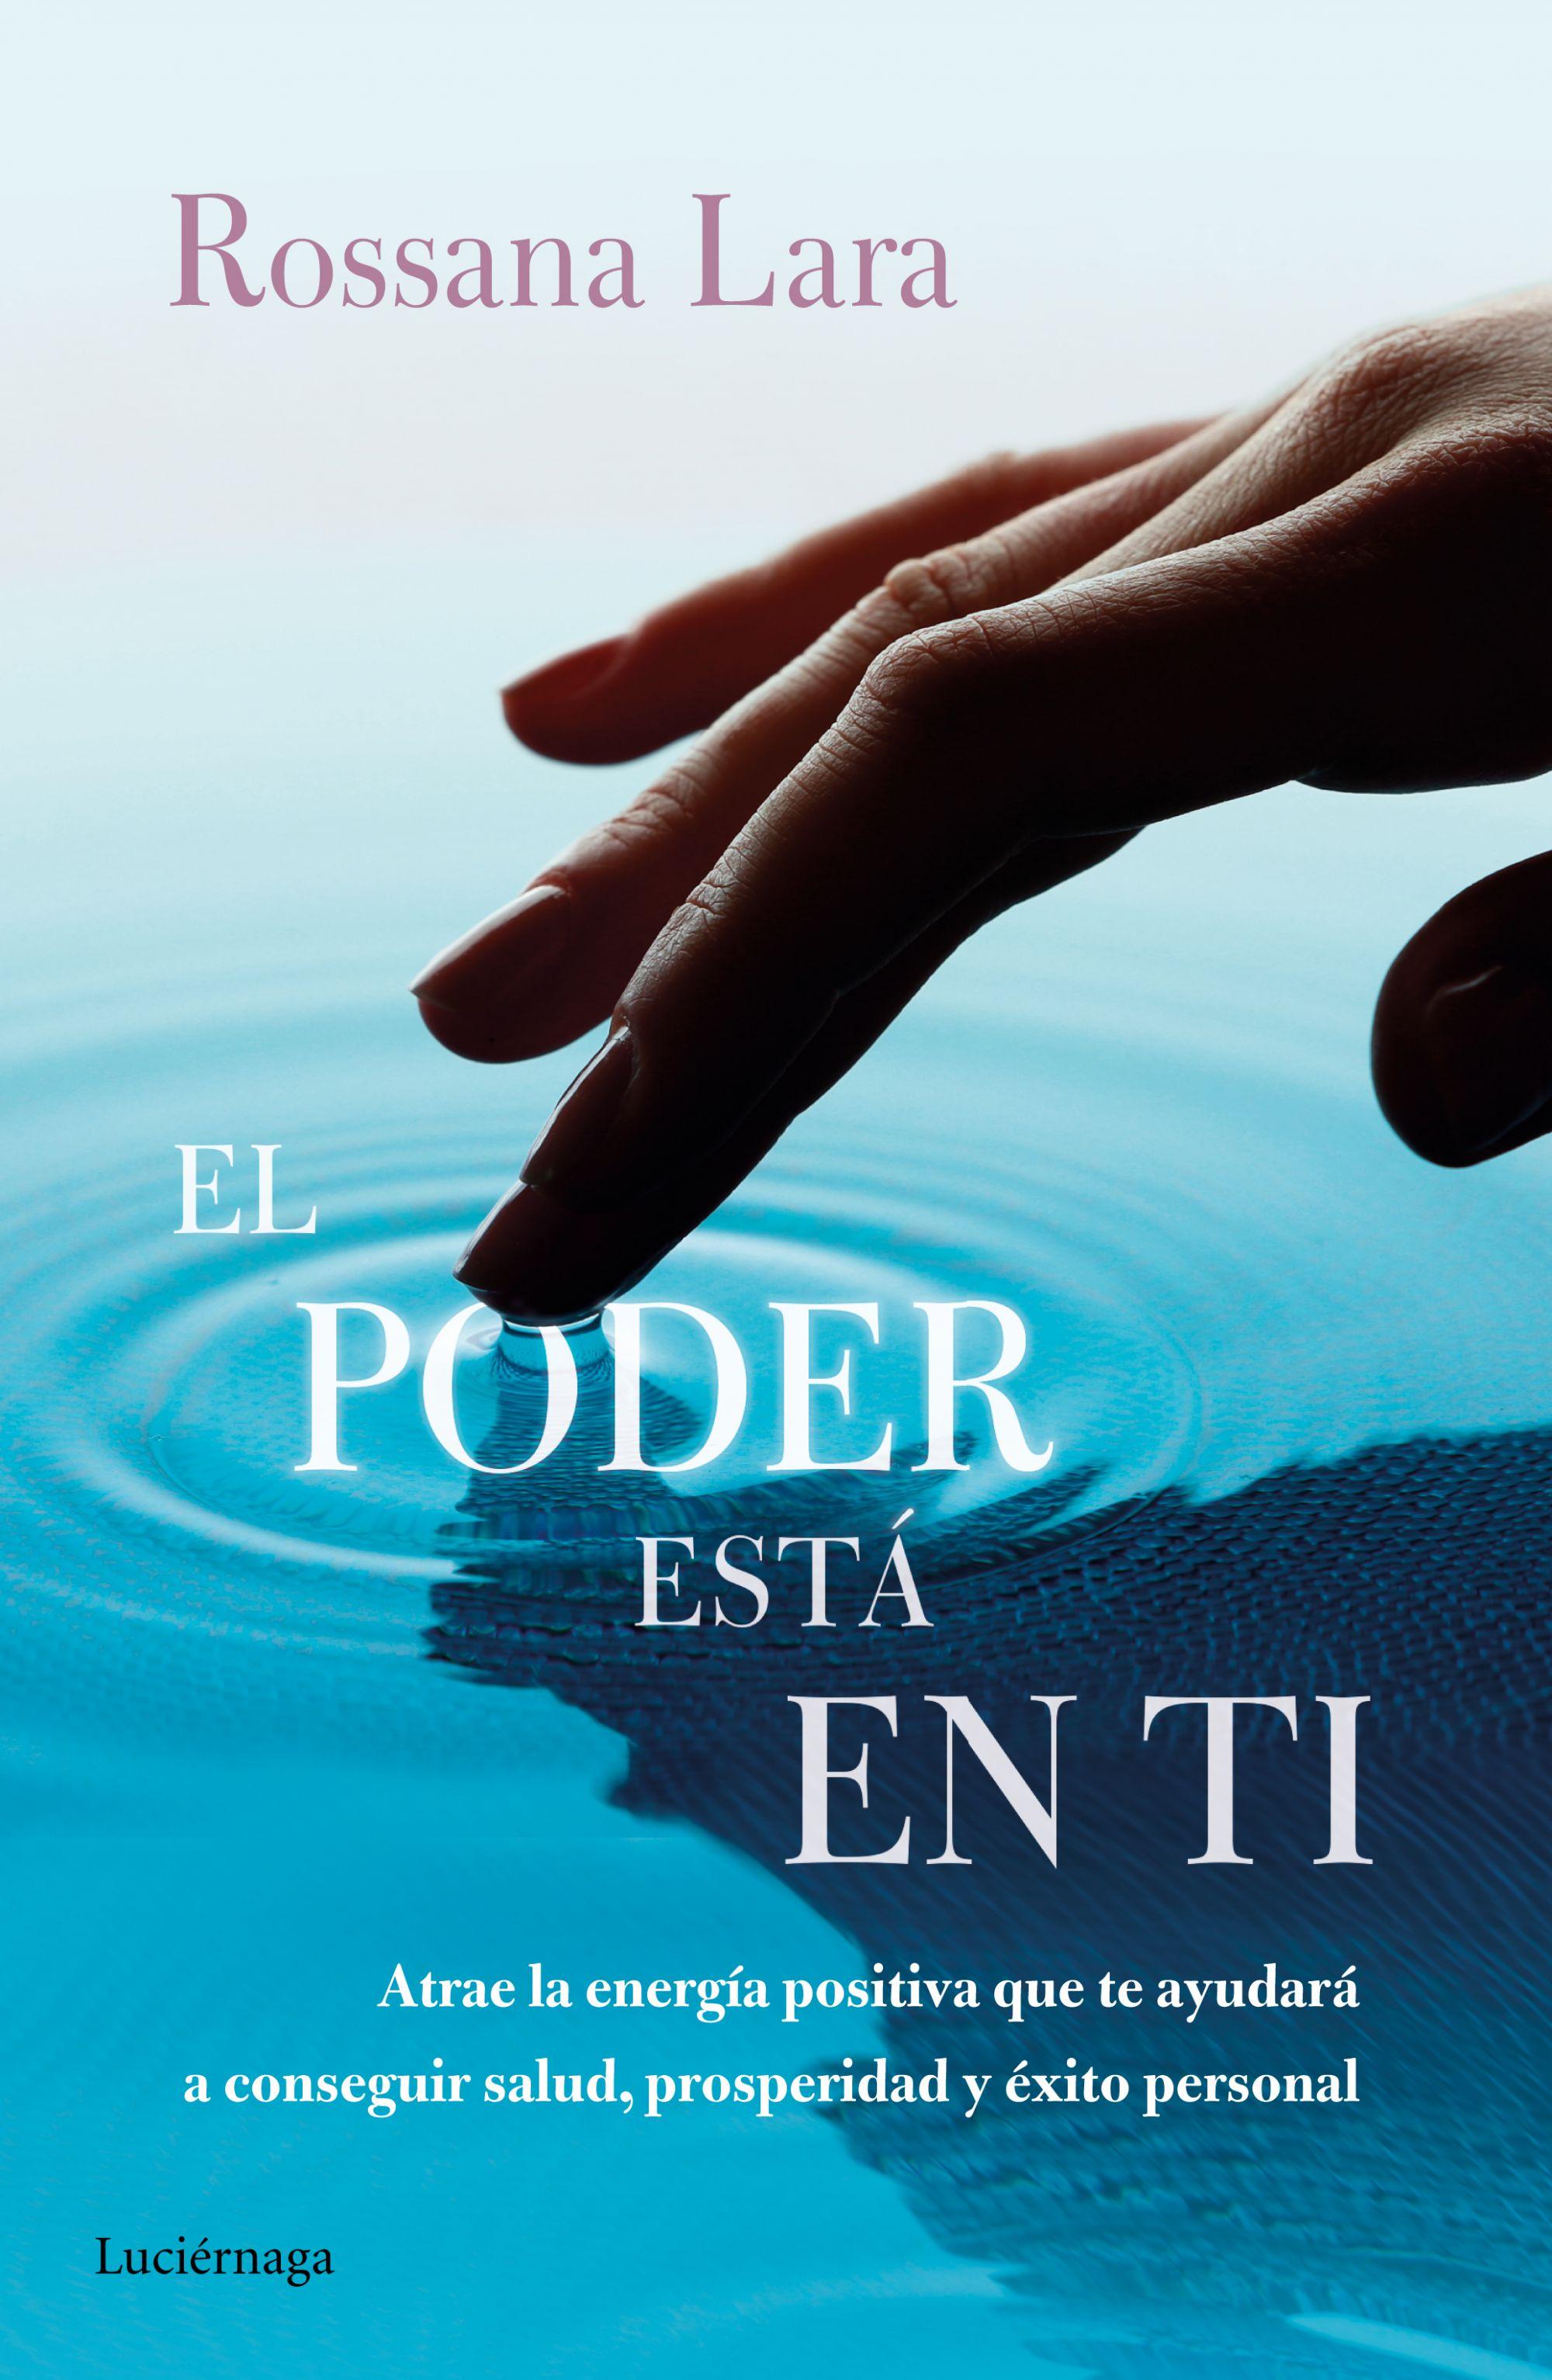 El poder está en ti (Rossana Lara)